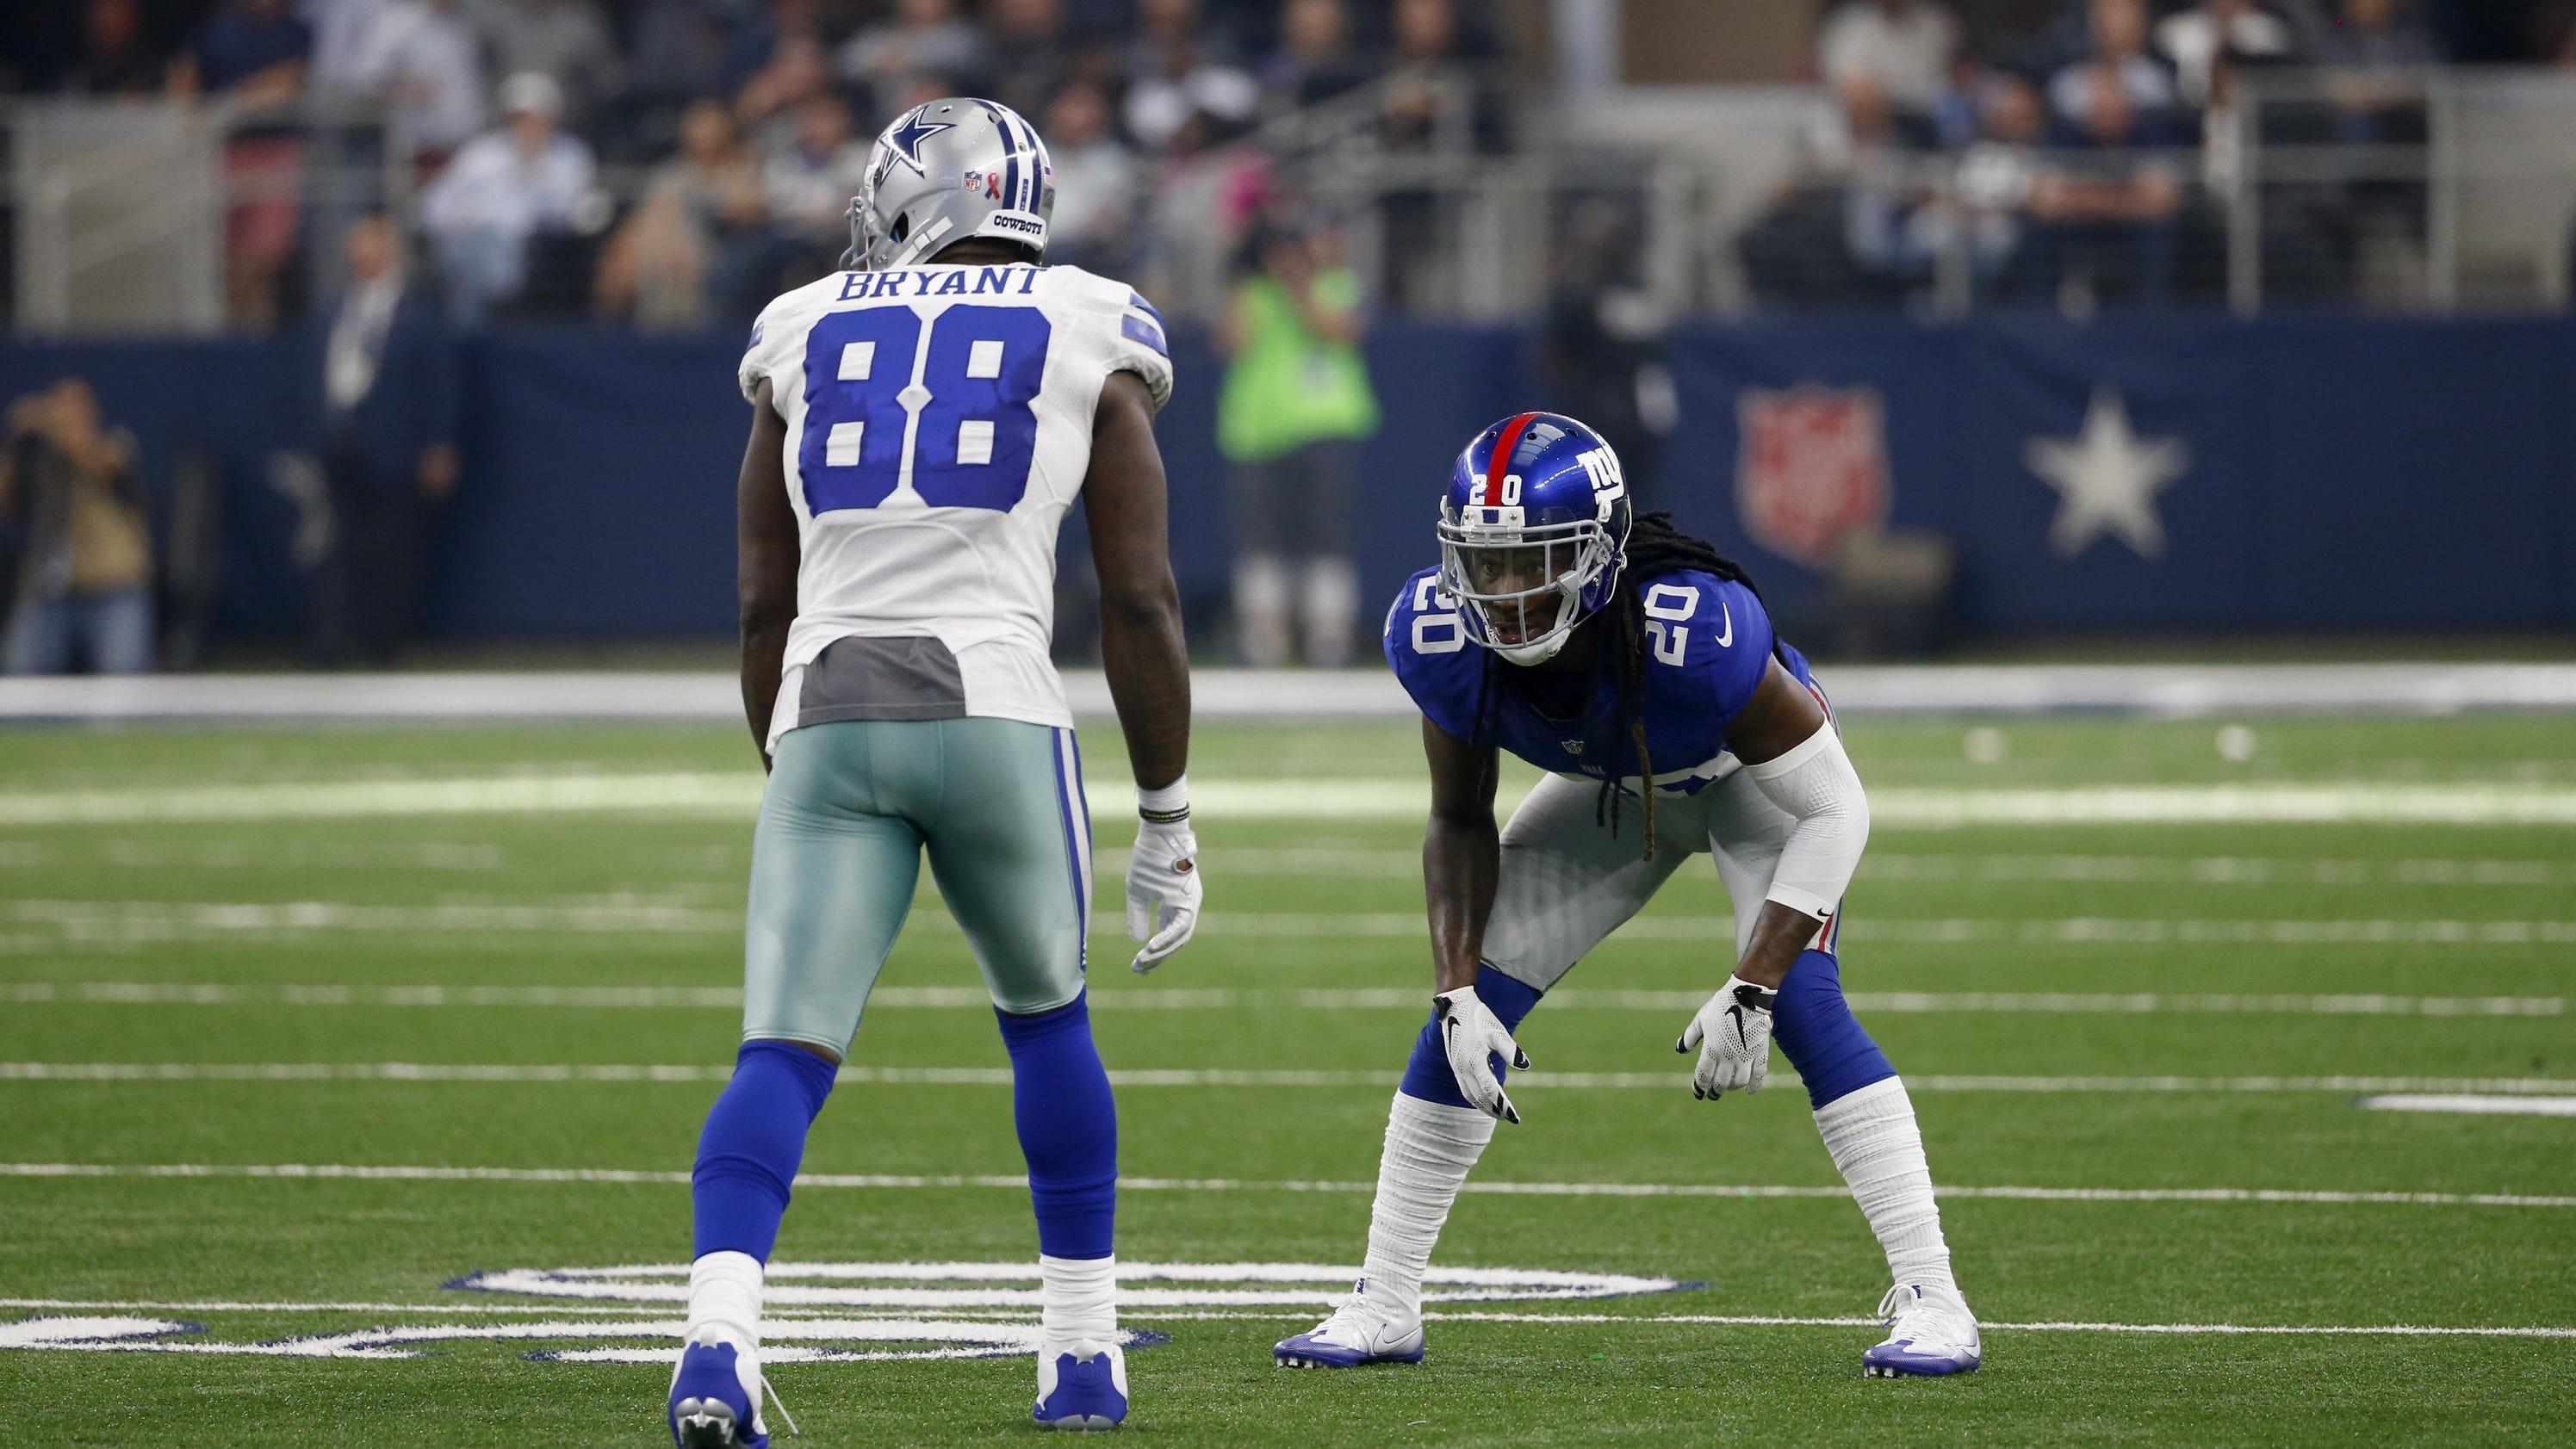 Giants trust in Janoris Jenkins pays off